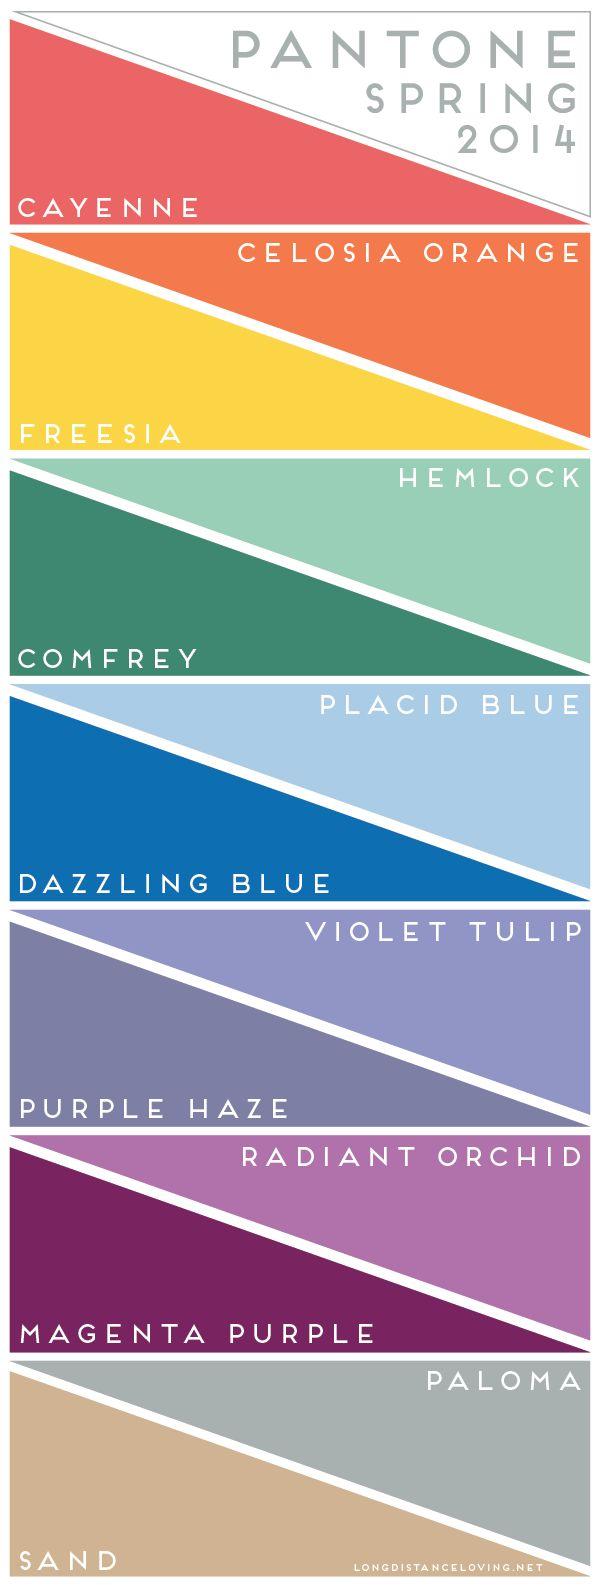 Pantone Color Report: Spring 2014